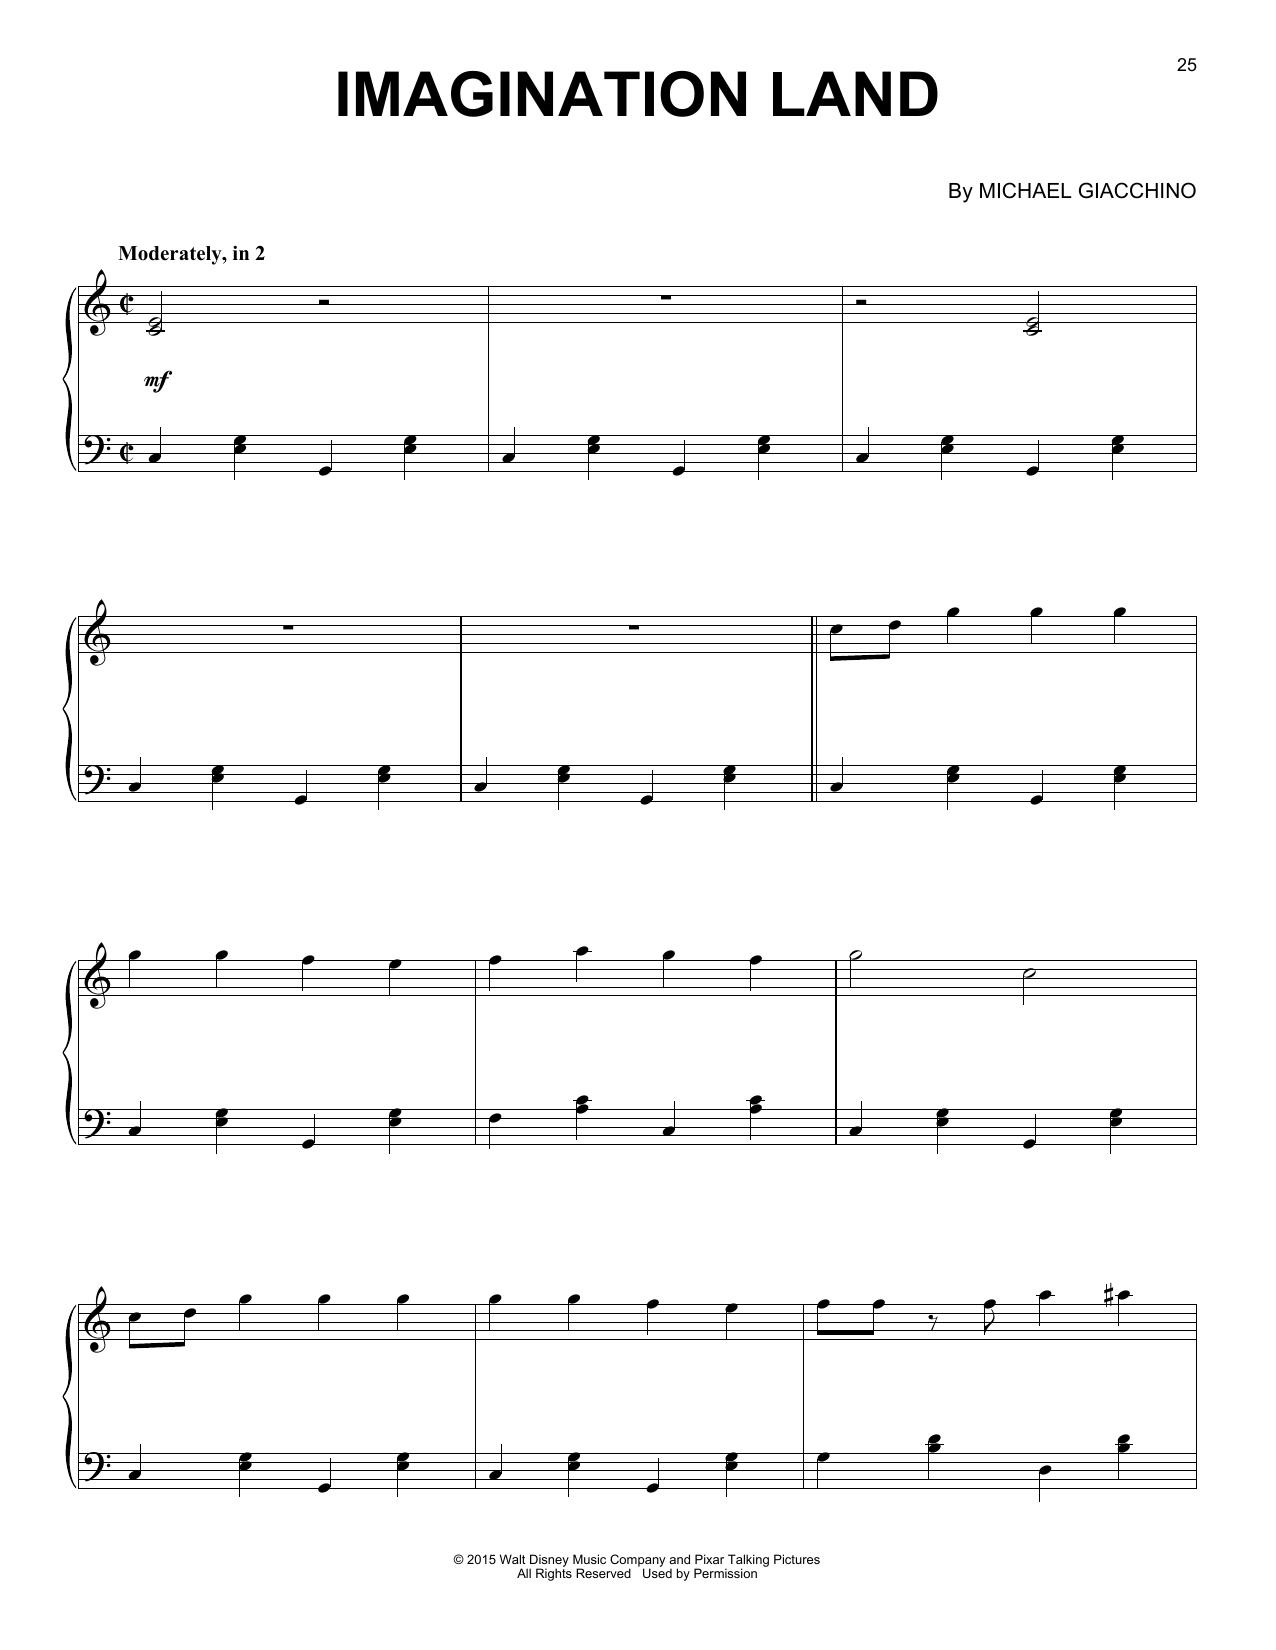 Michael Giacchino Imagination Land sheet music notes and chords. Download Printable PDF.